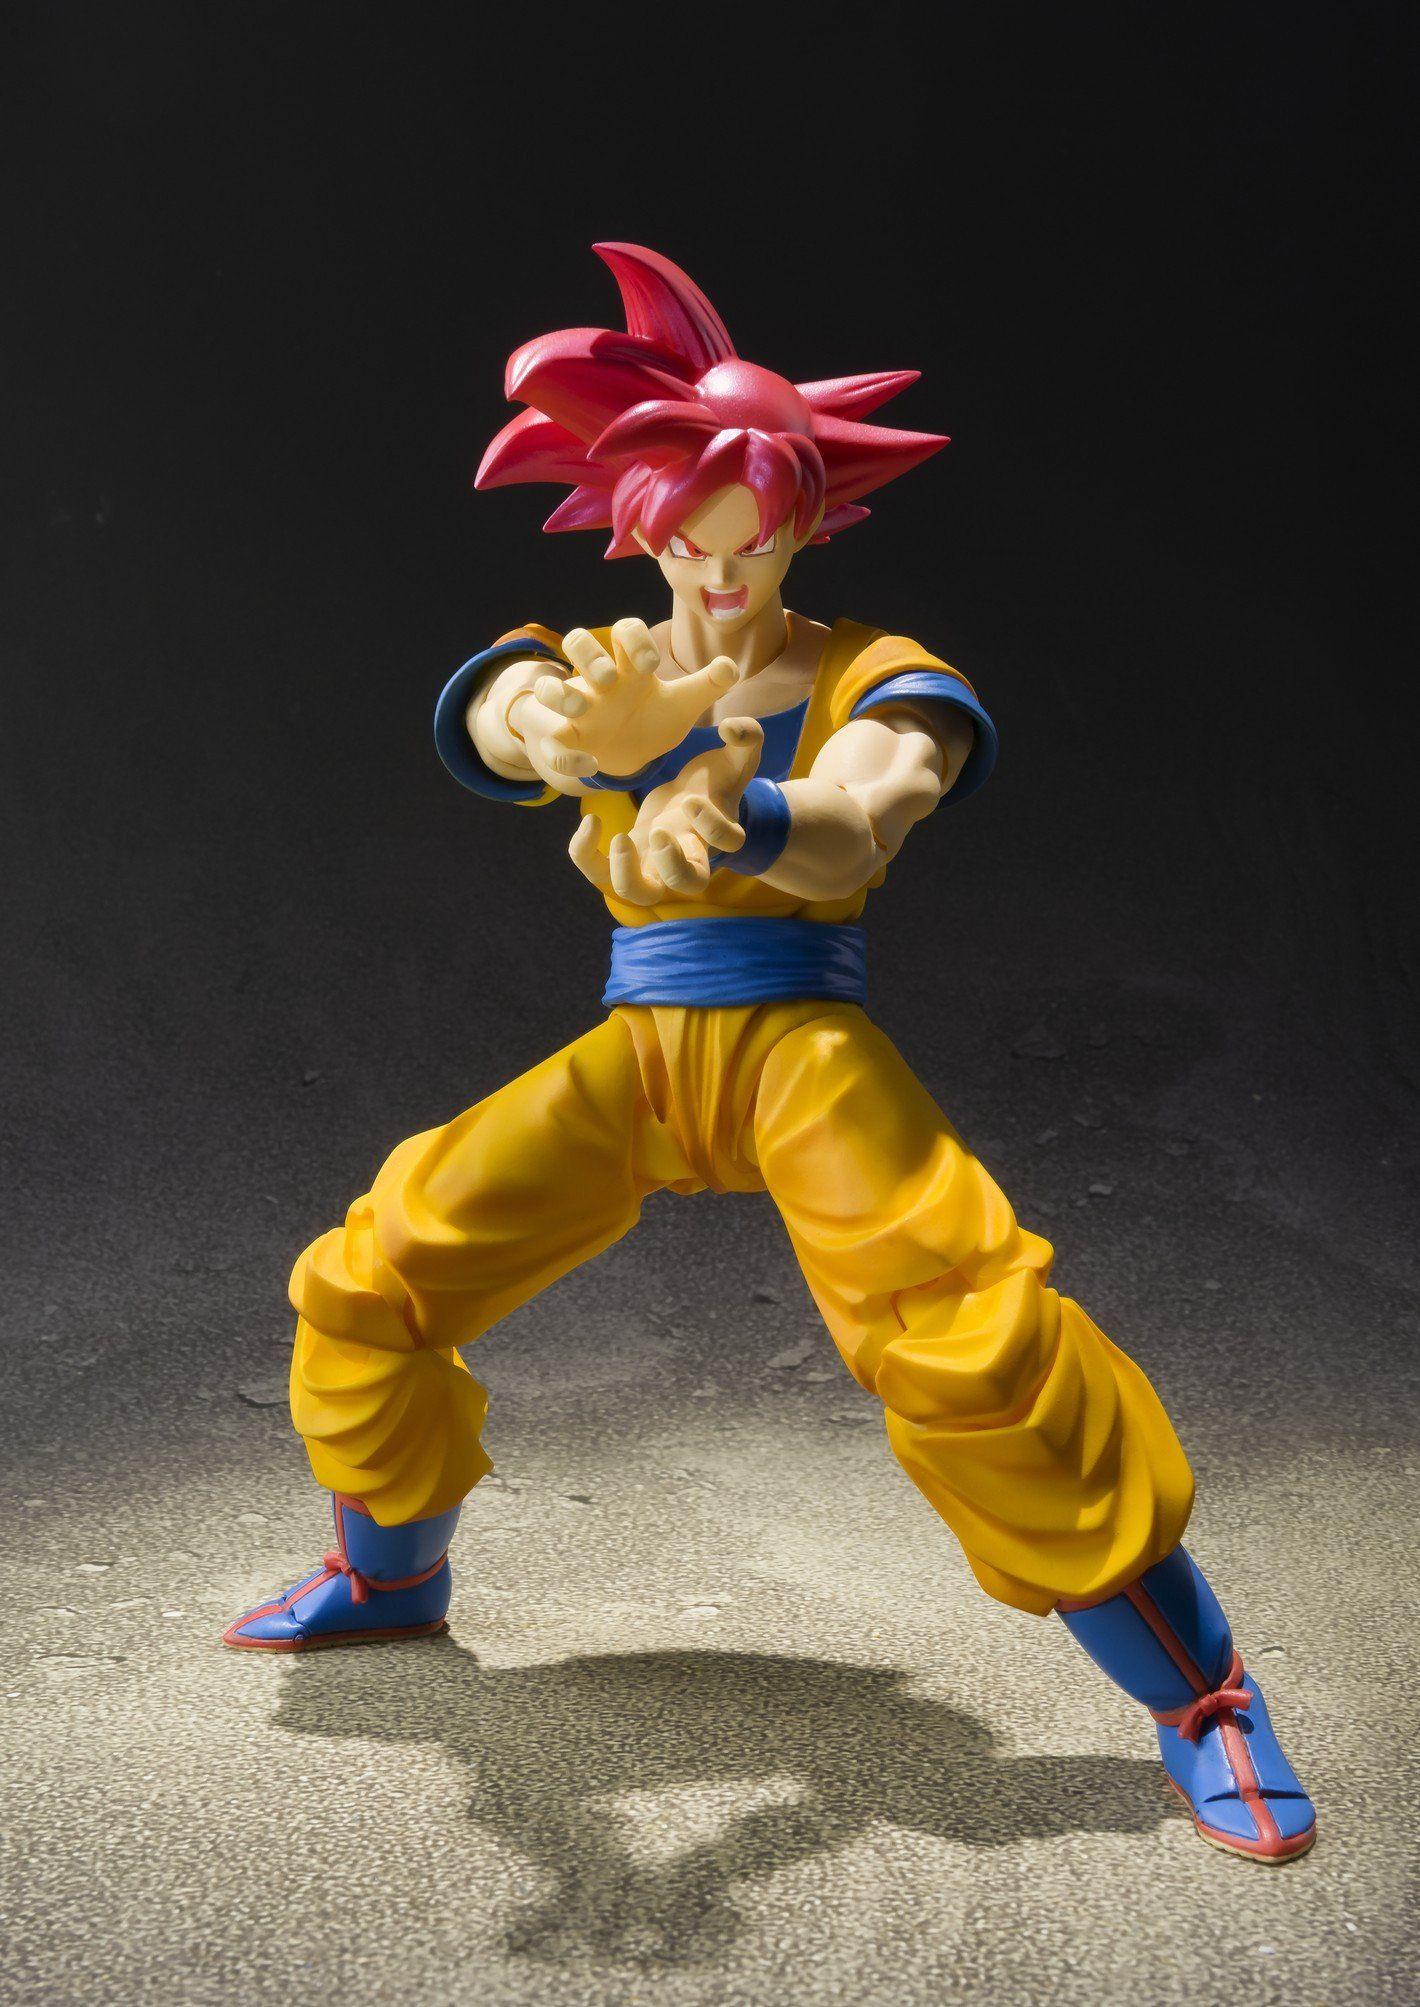 Figure dbs the Super warriors Vol 4 Dragonball SAIYAN God Son Gokou Son-Goku Action- & Spielfiguren